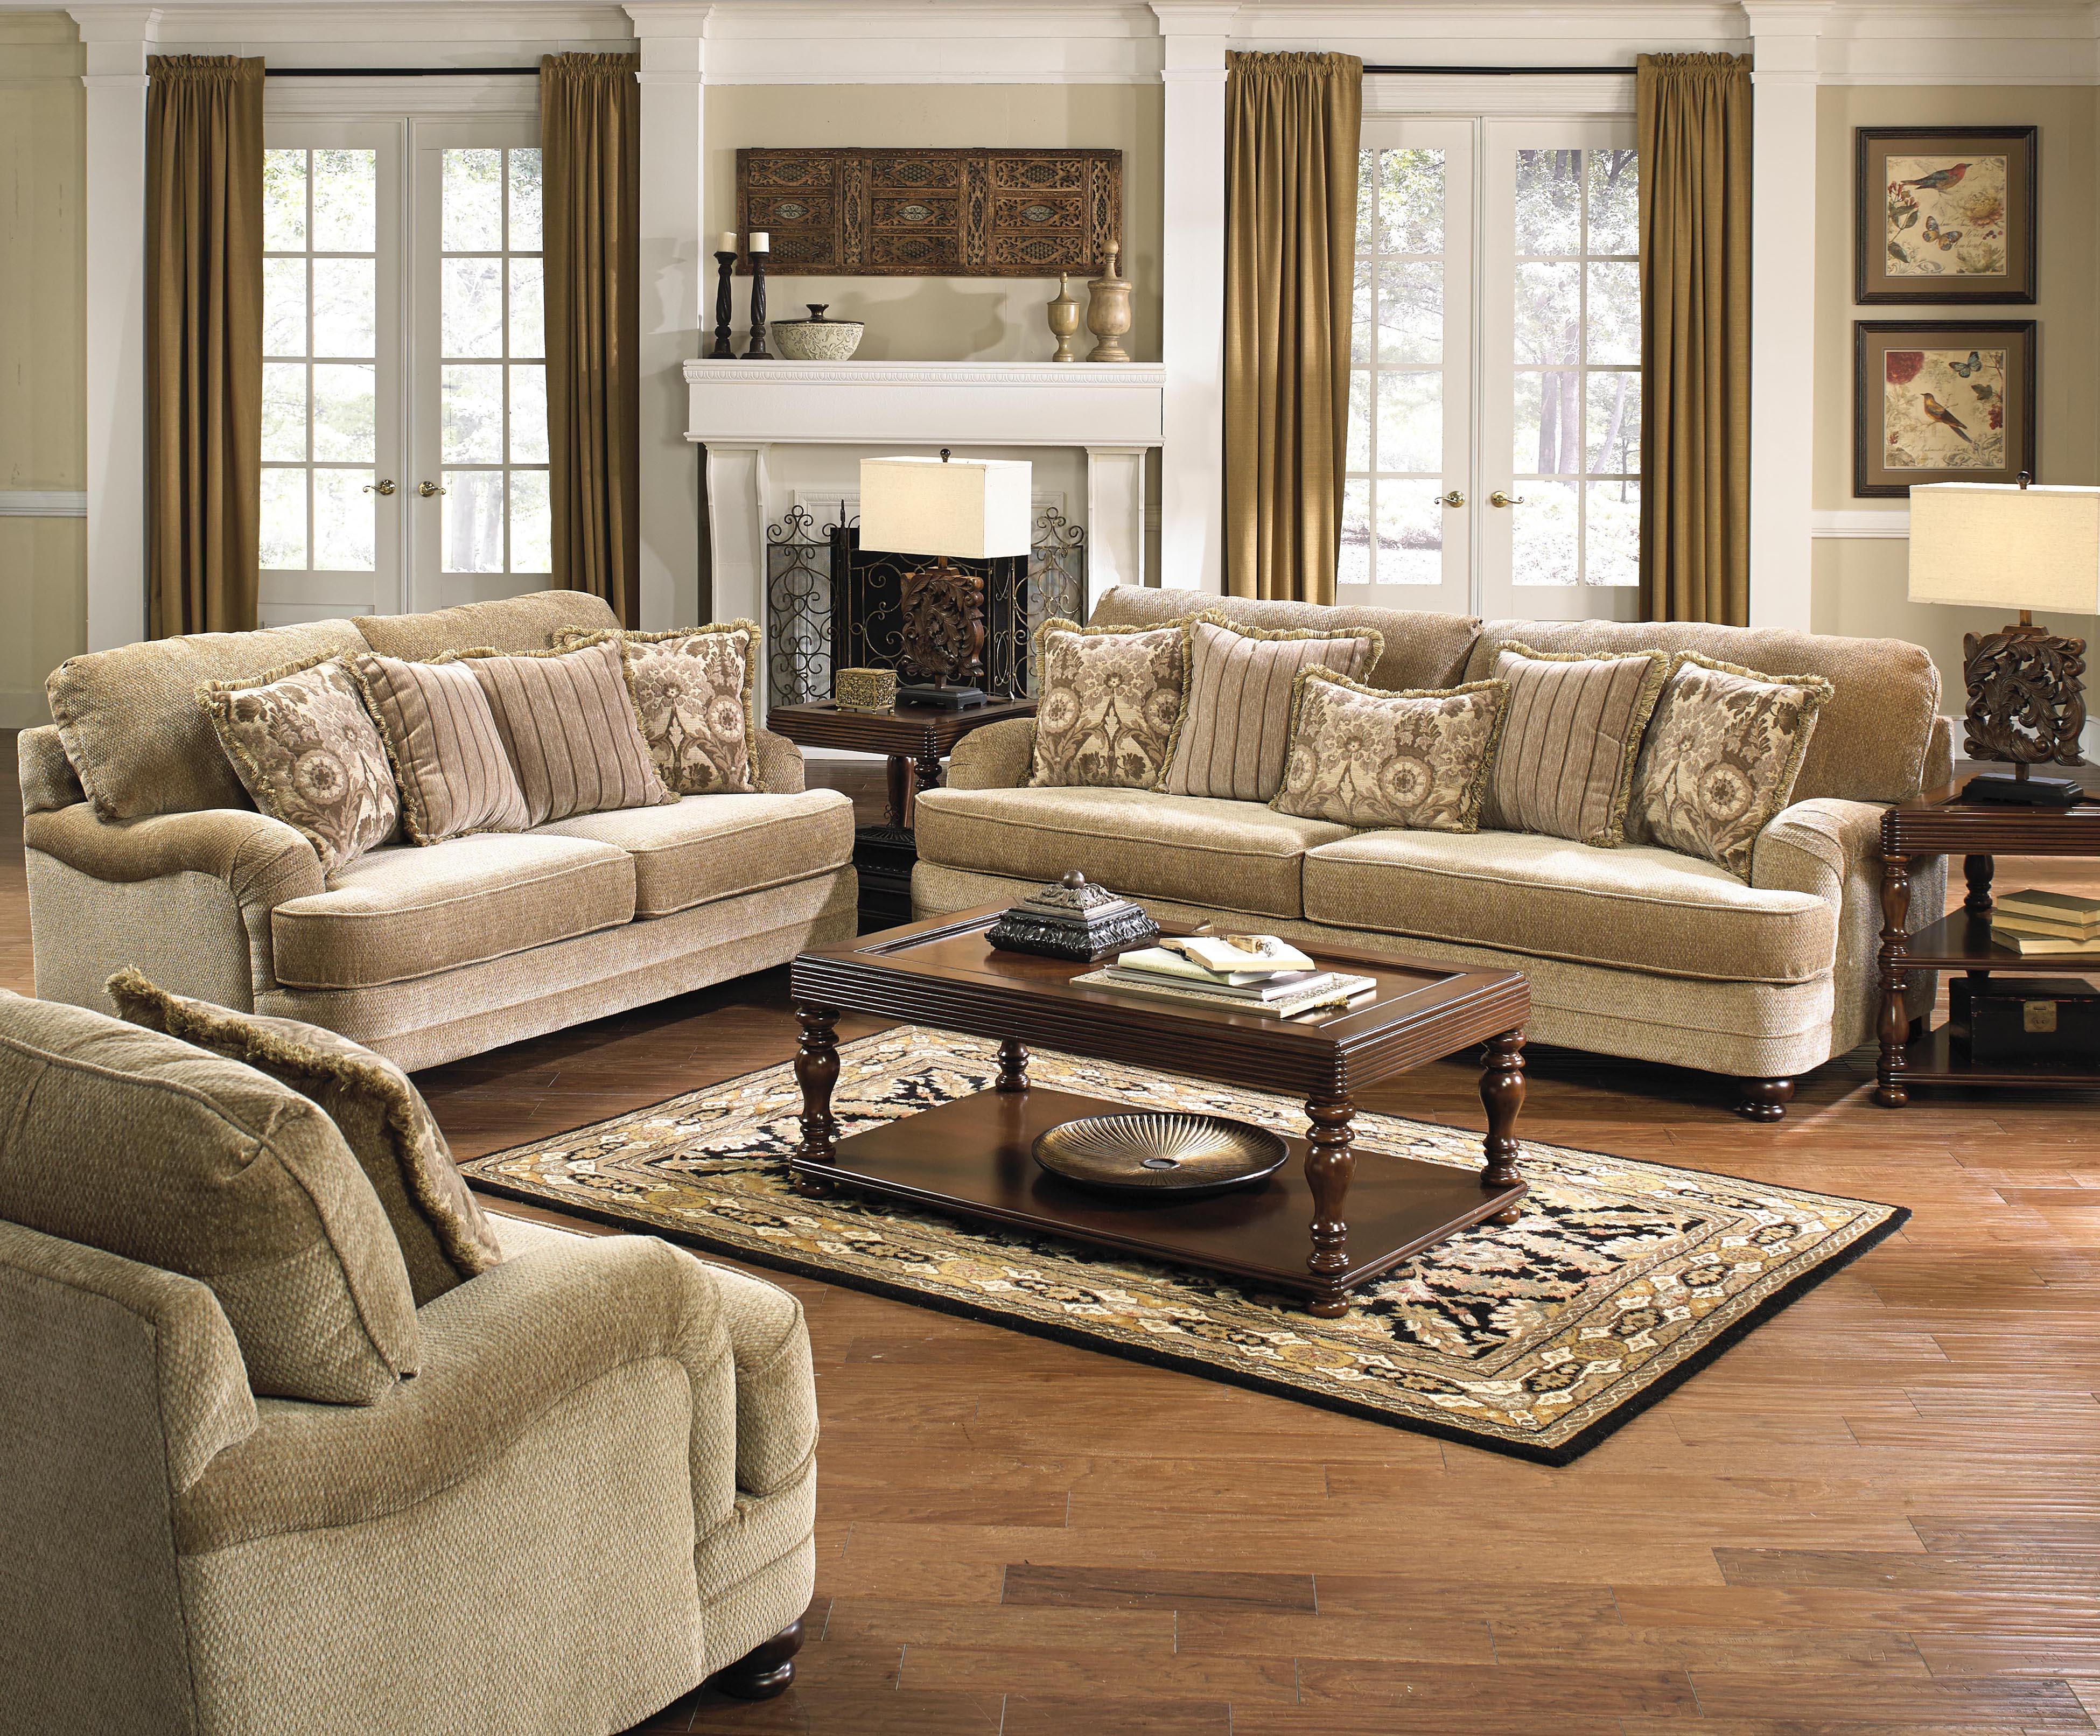 Jackson Furniture Stationary Upholstery Collection Brennan 4438. Jackson Furniture Stationary Upholstery Collection Brennan 4438